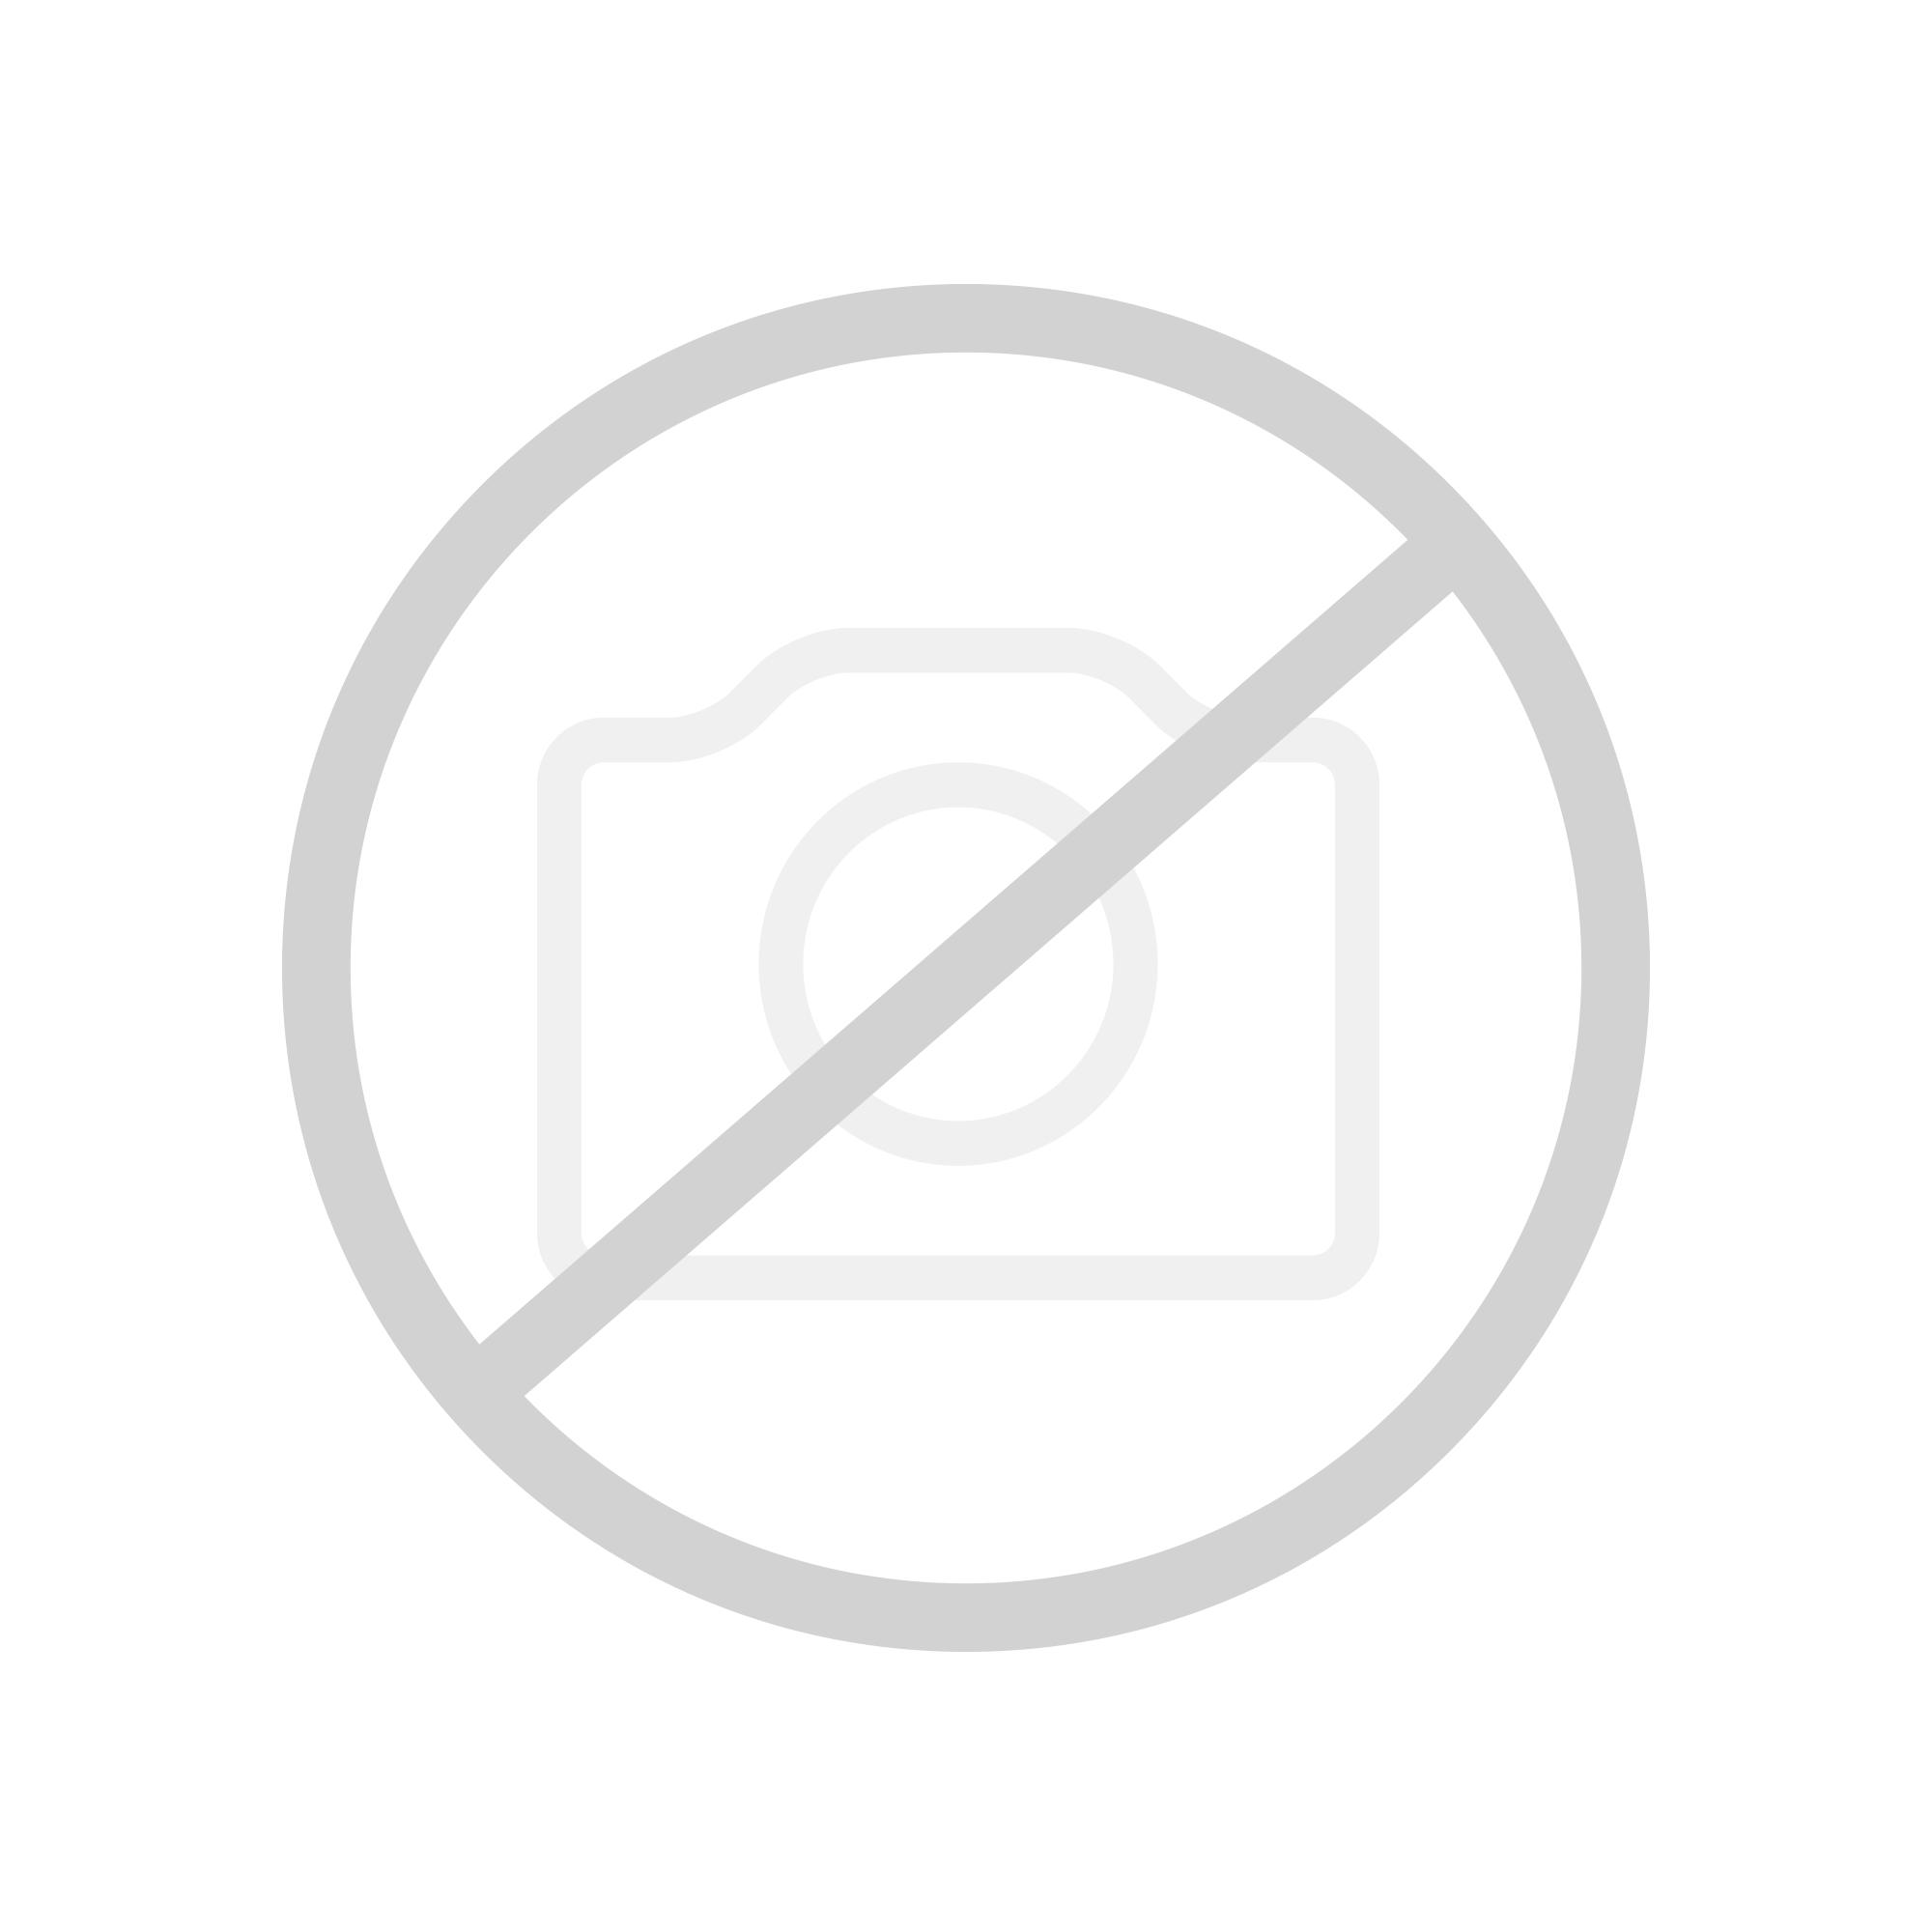 keuco moll badetuchhalter 12701010600 reuter. Black Bedroom Furniture Sets. Home Design Ideas